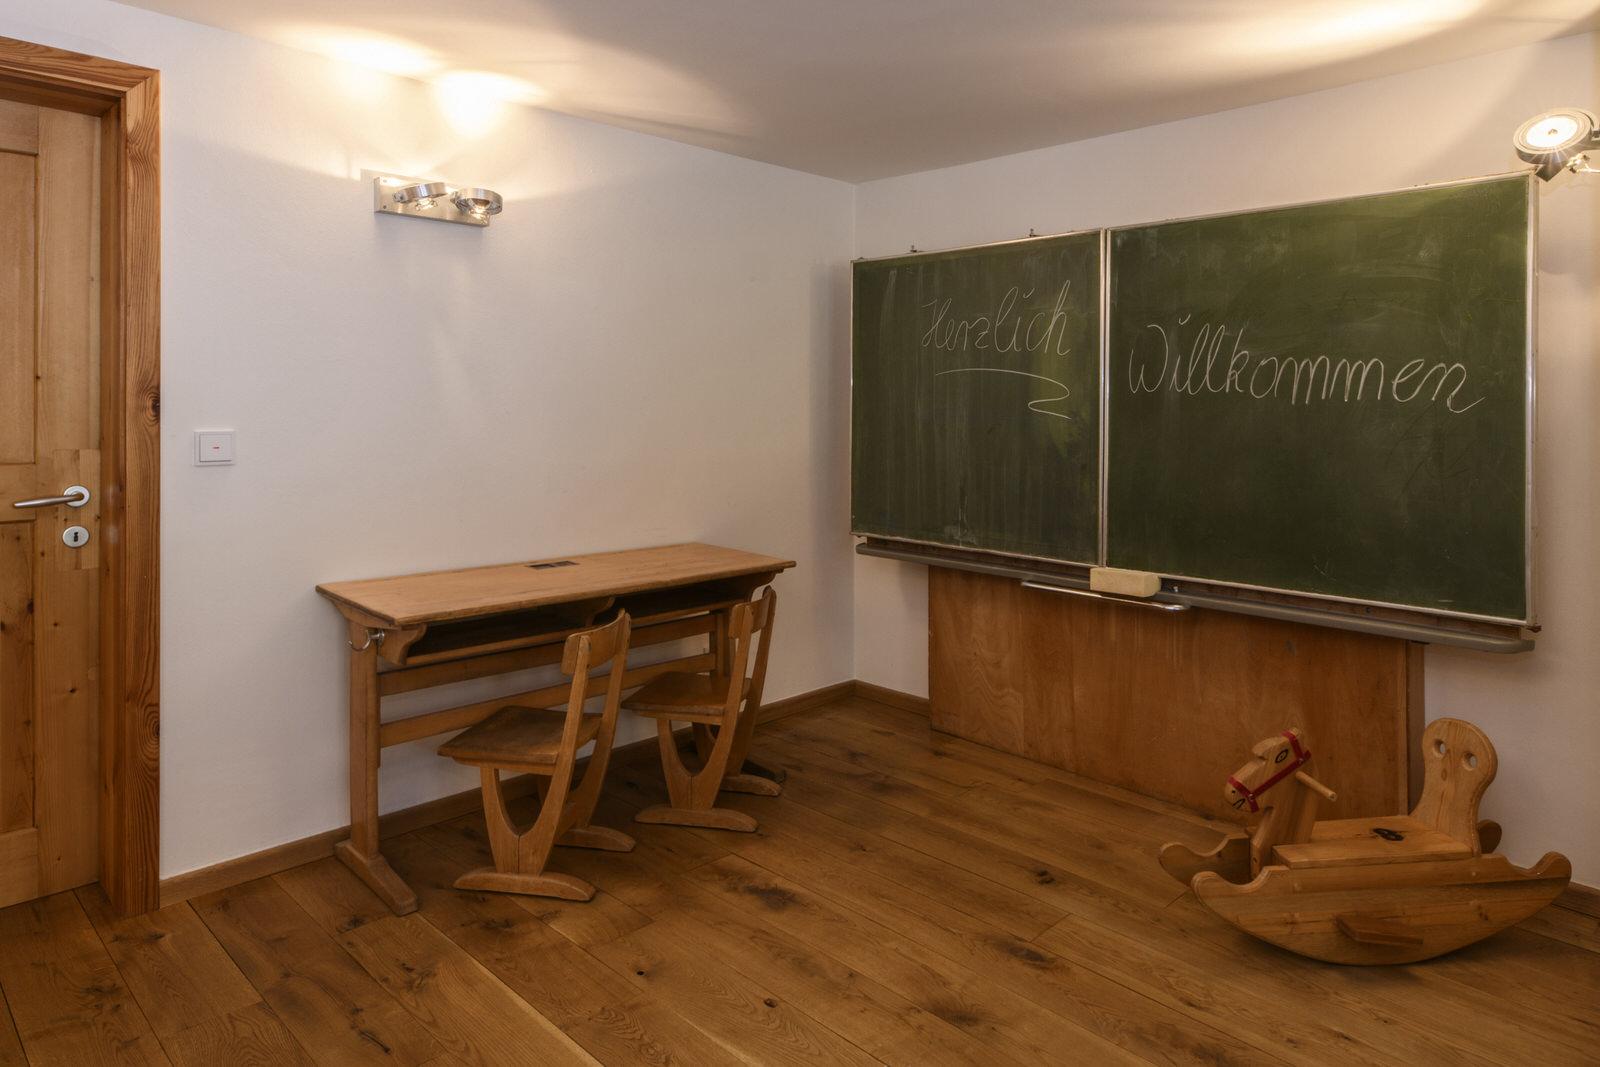 Mountain lodge Old Schoolhouse - Montafon - Schruns